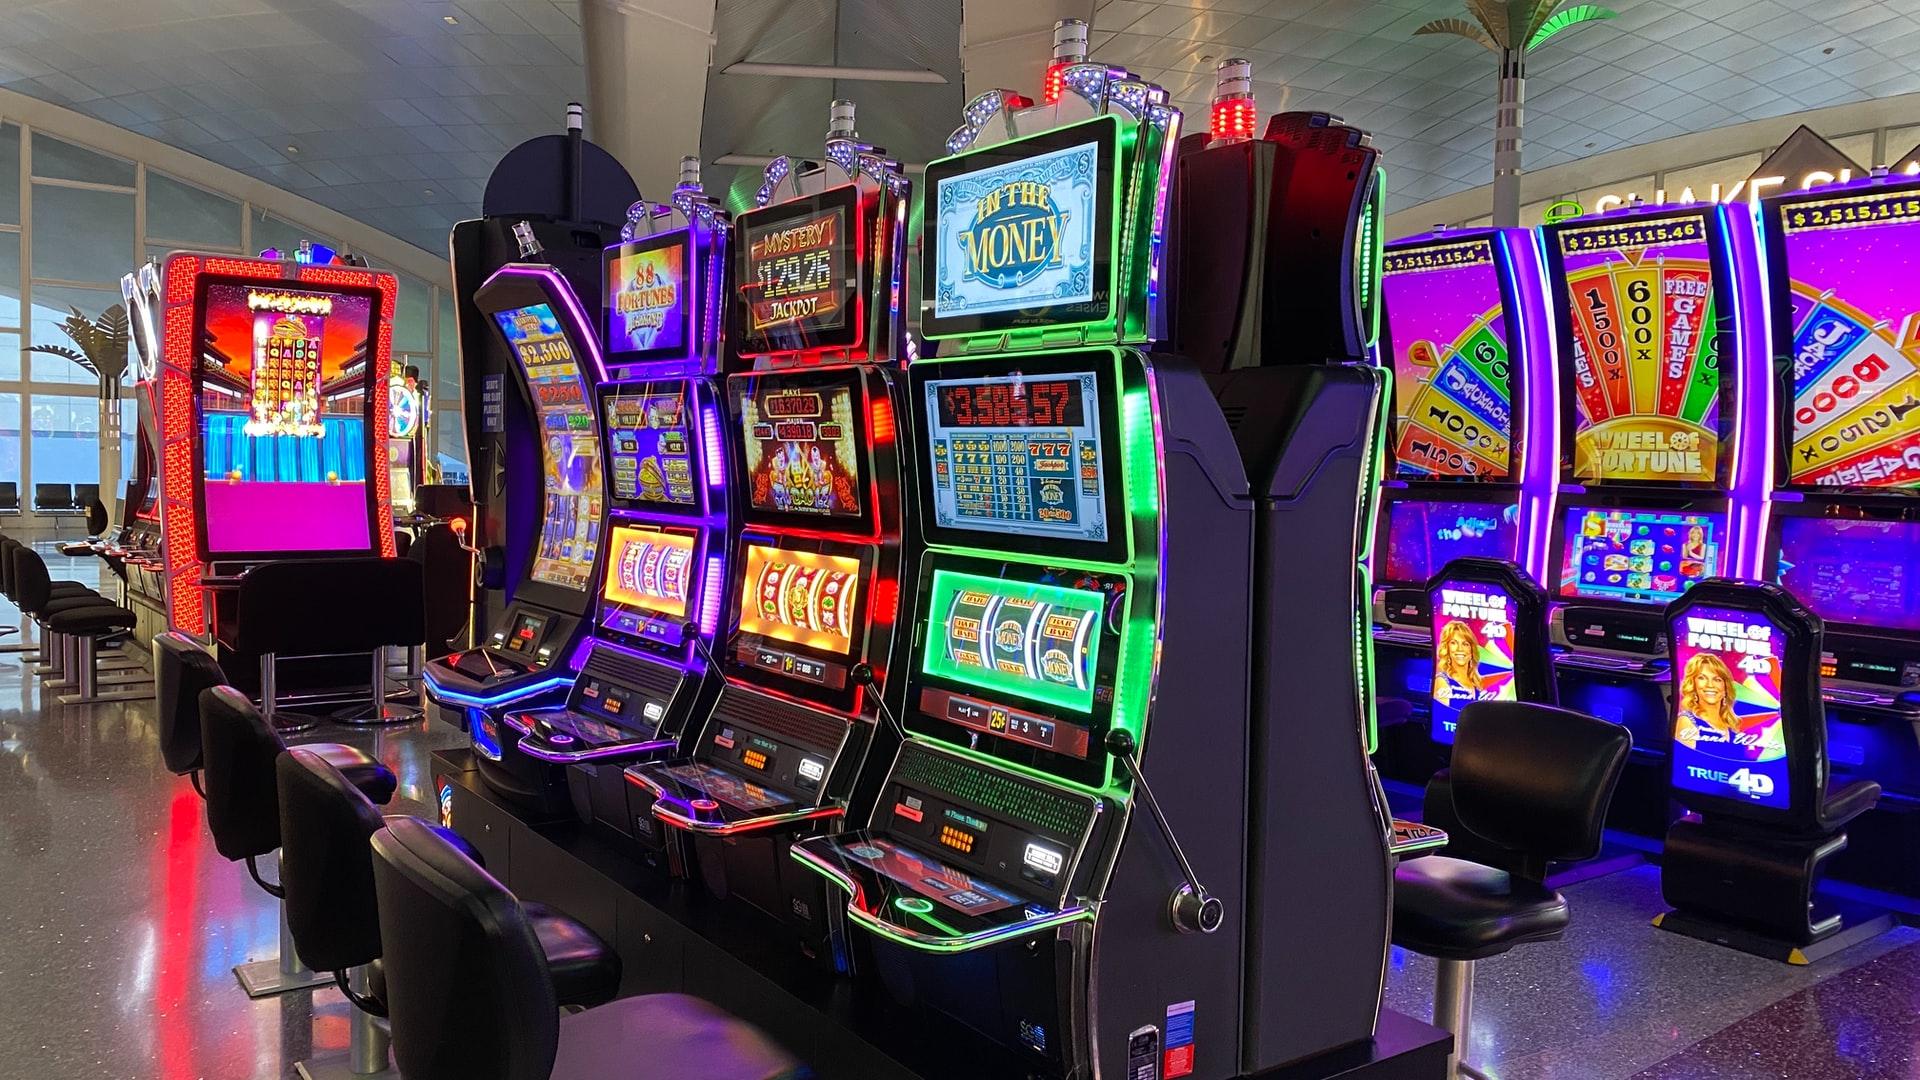 Important factors to consider when choosing an online gambling website